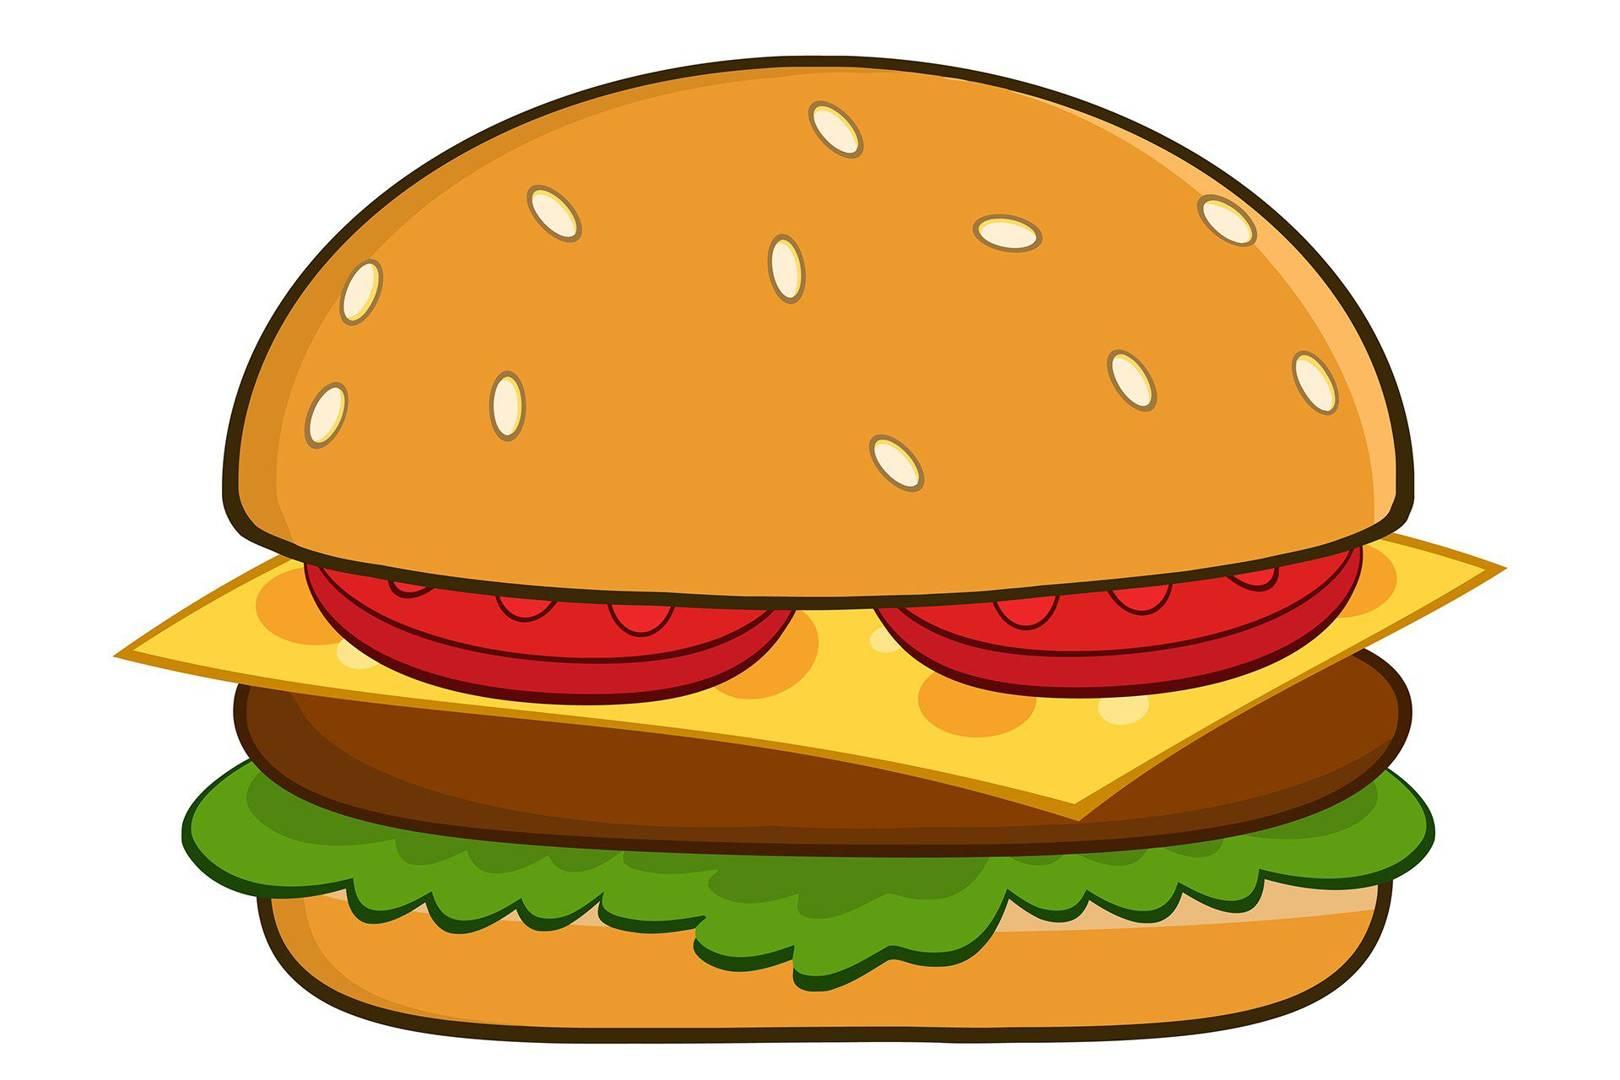 Burgerburger how to order. Burger clipart emoji